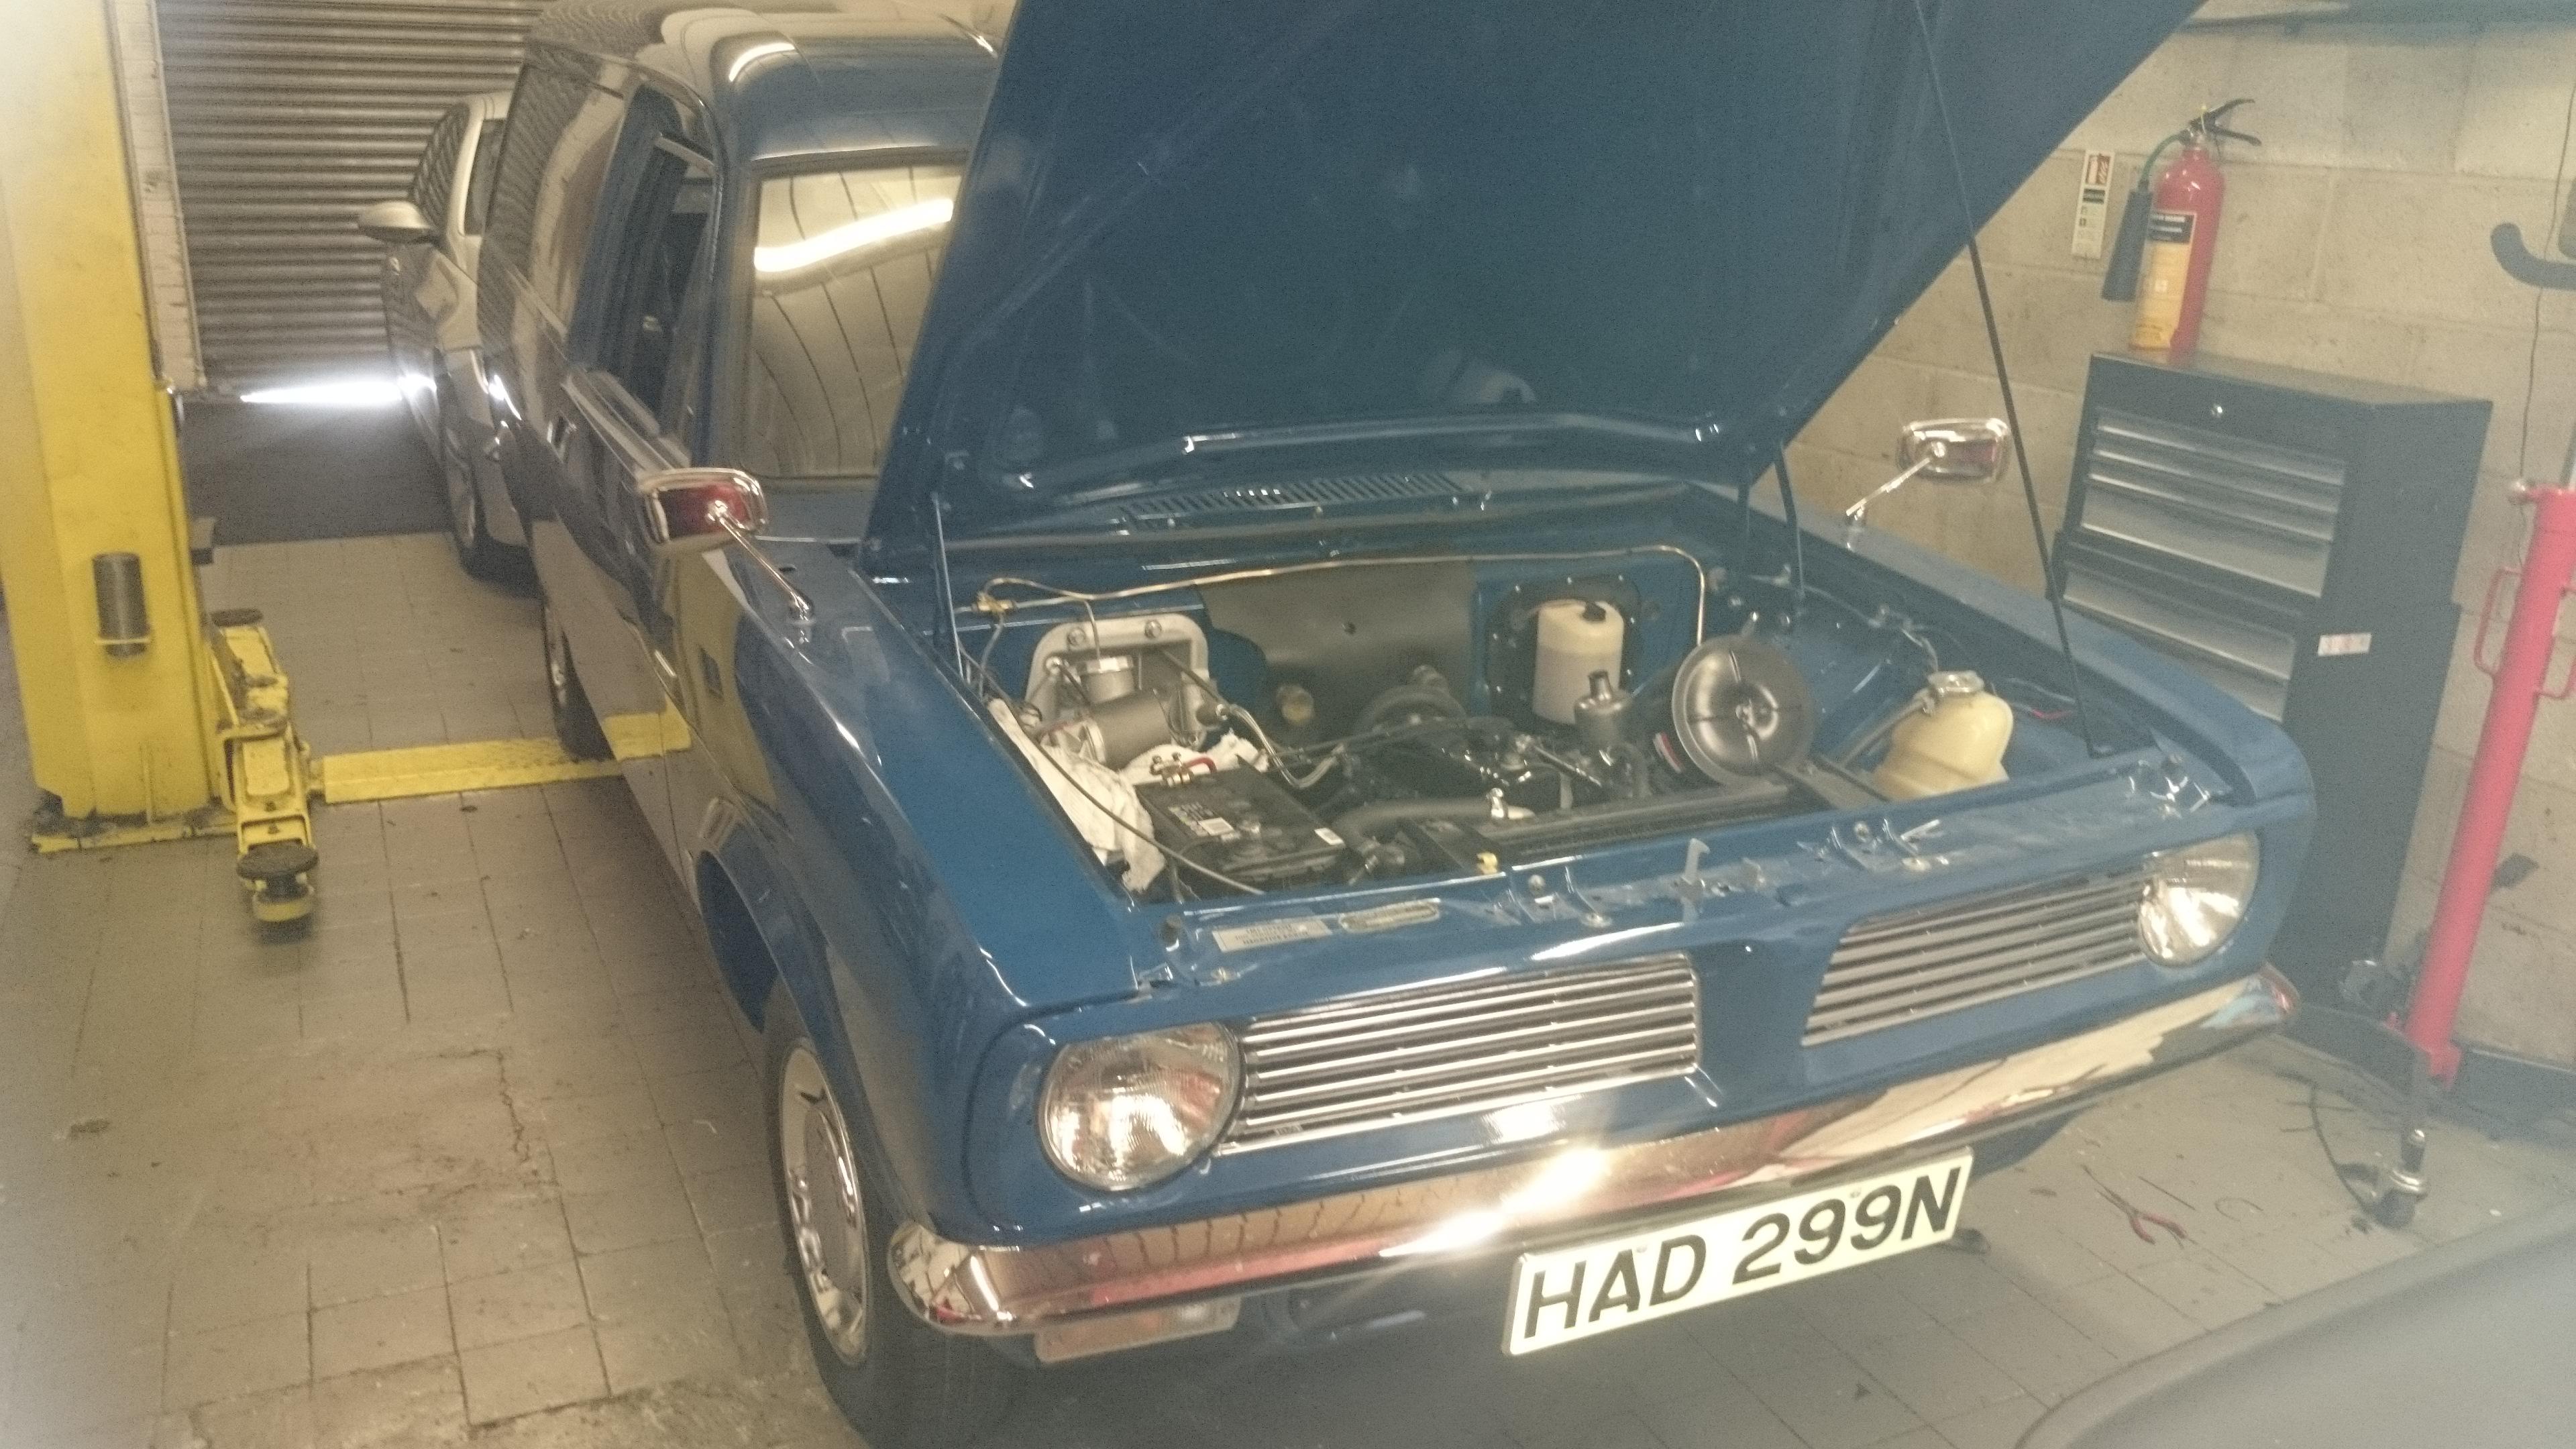 The old classics! - Car Electrics & Repairs